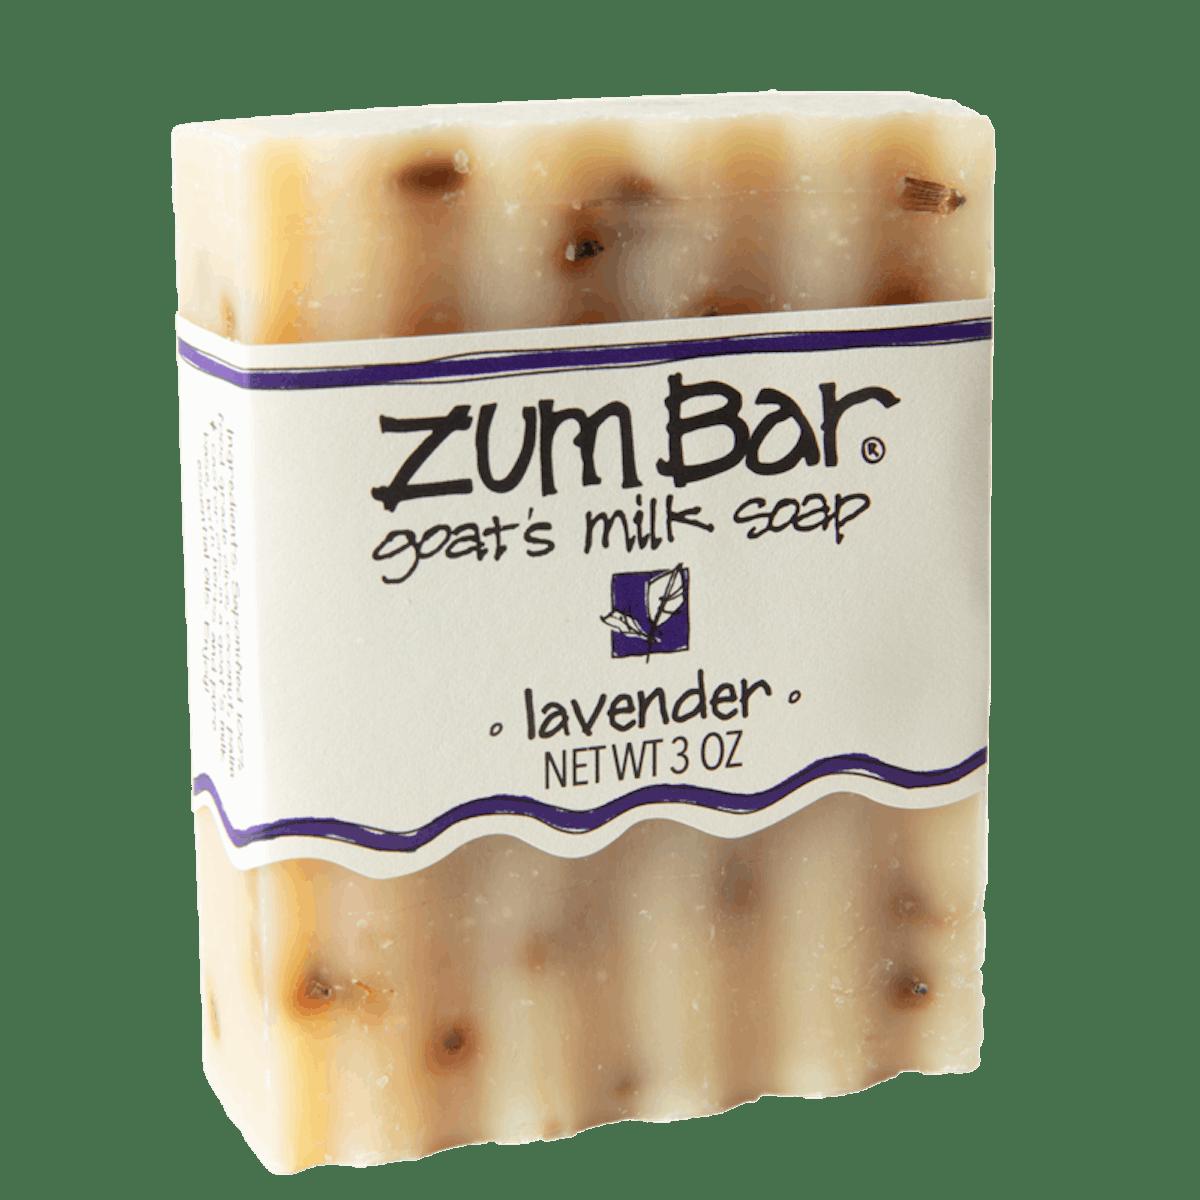 Lavender Zum Bar Goat's Milk Soap